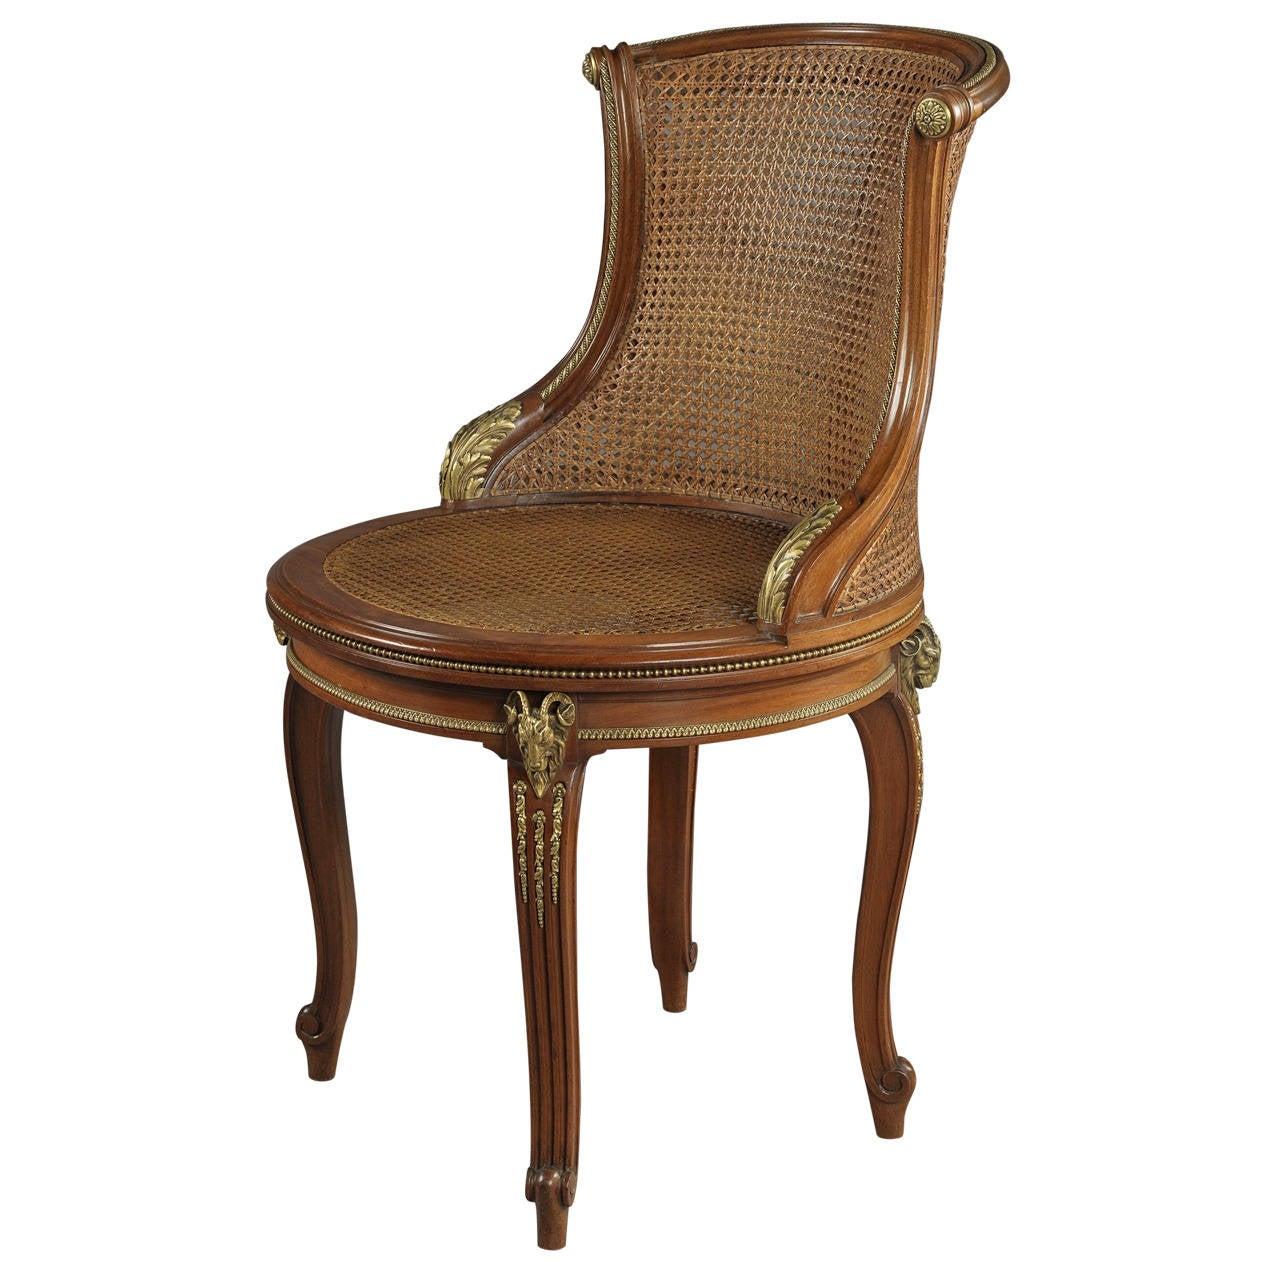 Mahogany Desk Chair by François Linke